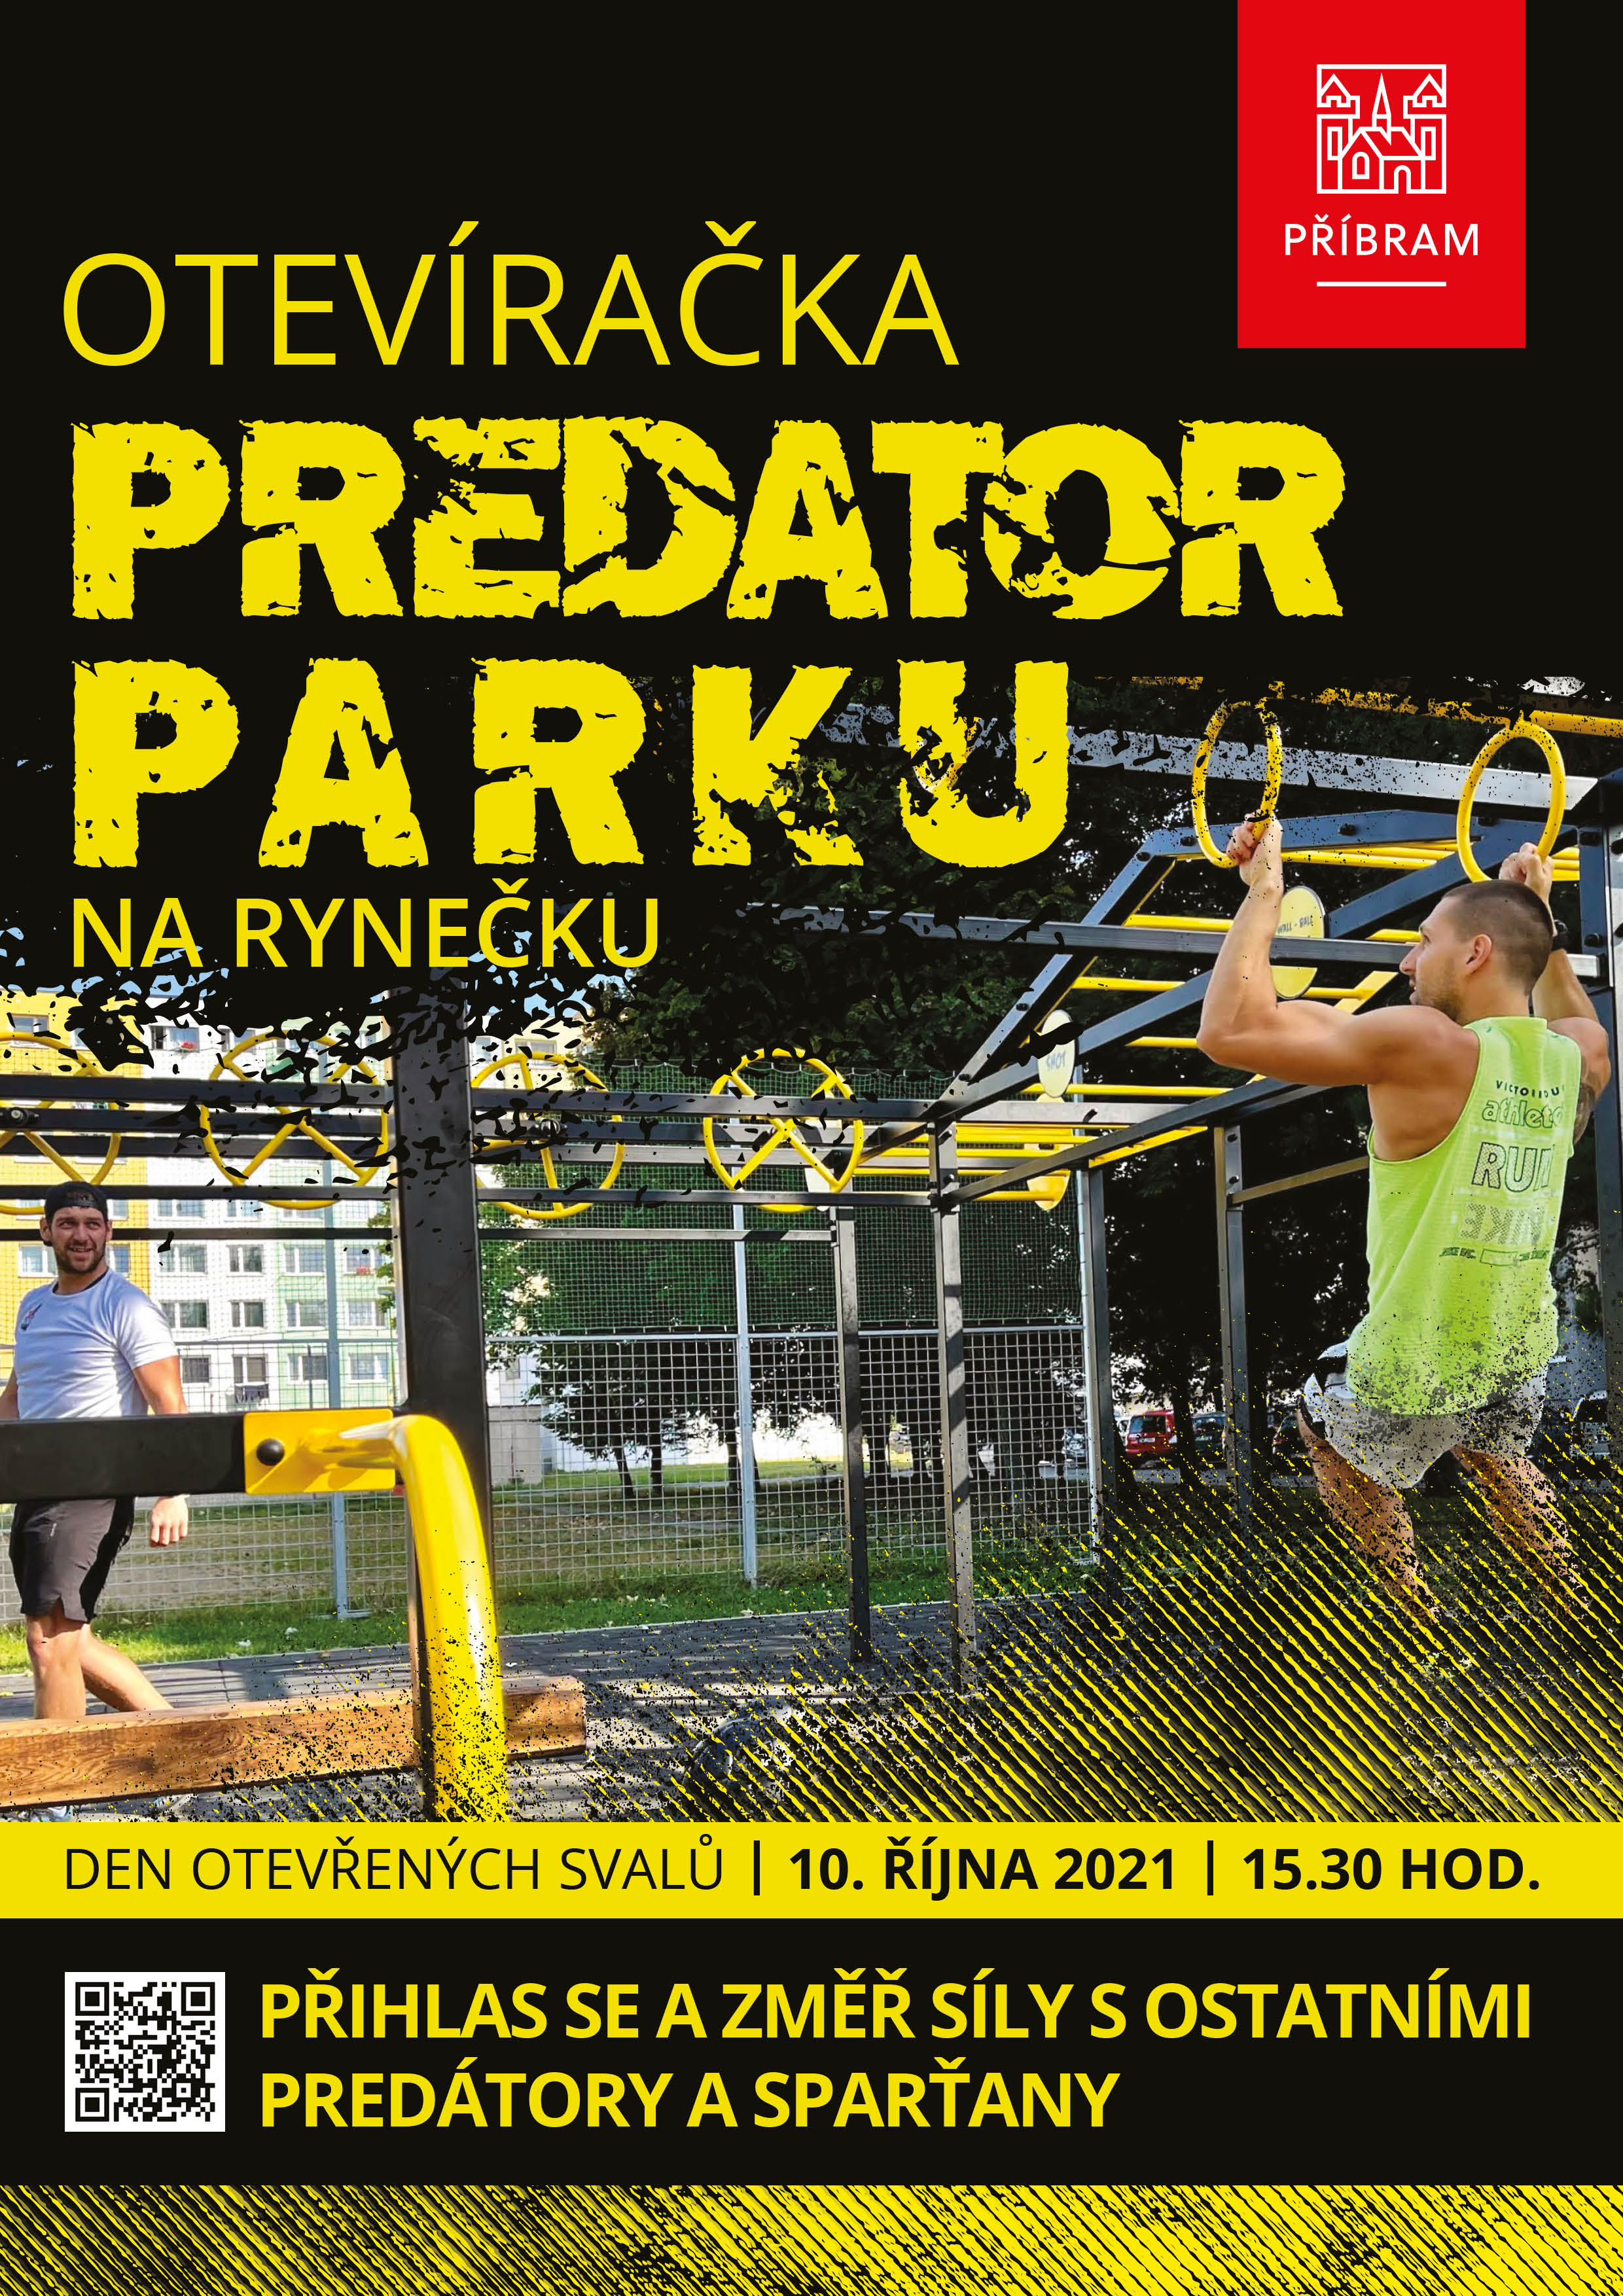 Akce na Predator parku